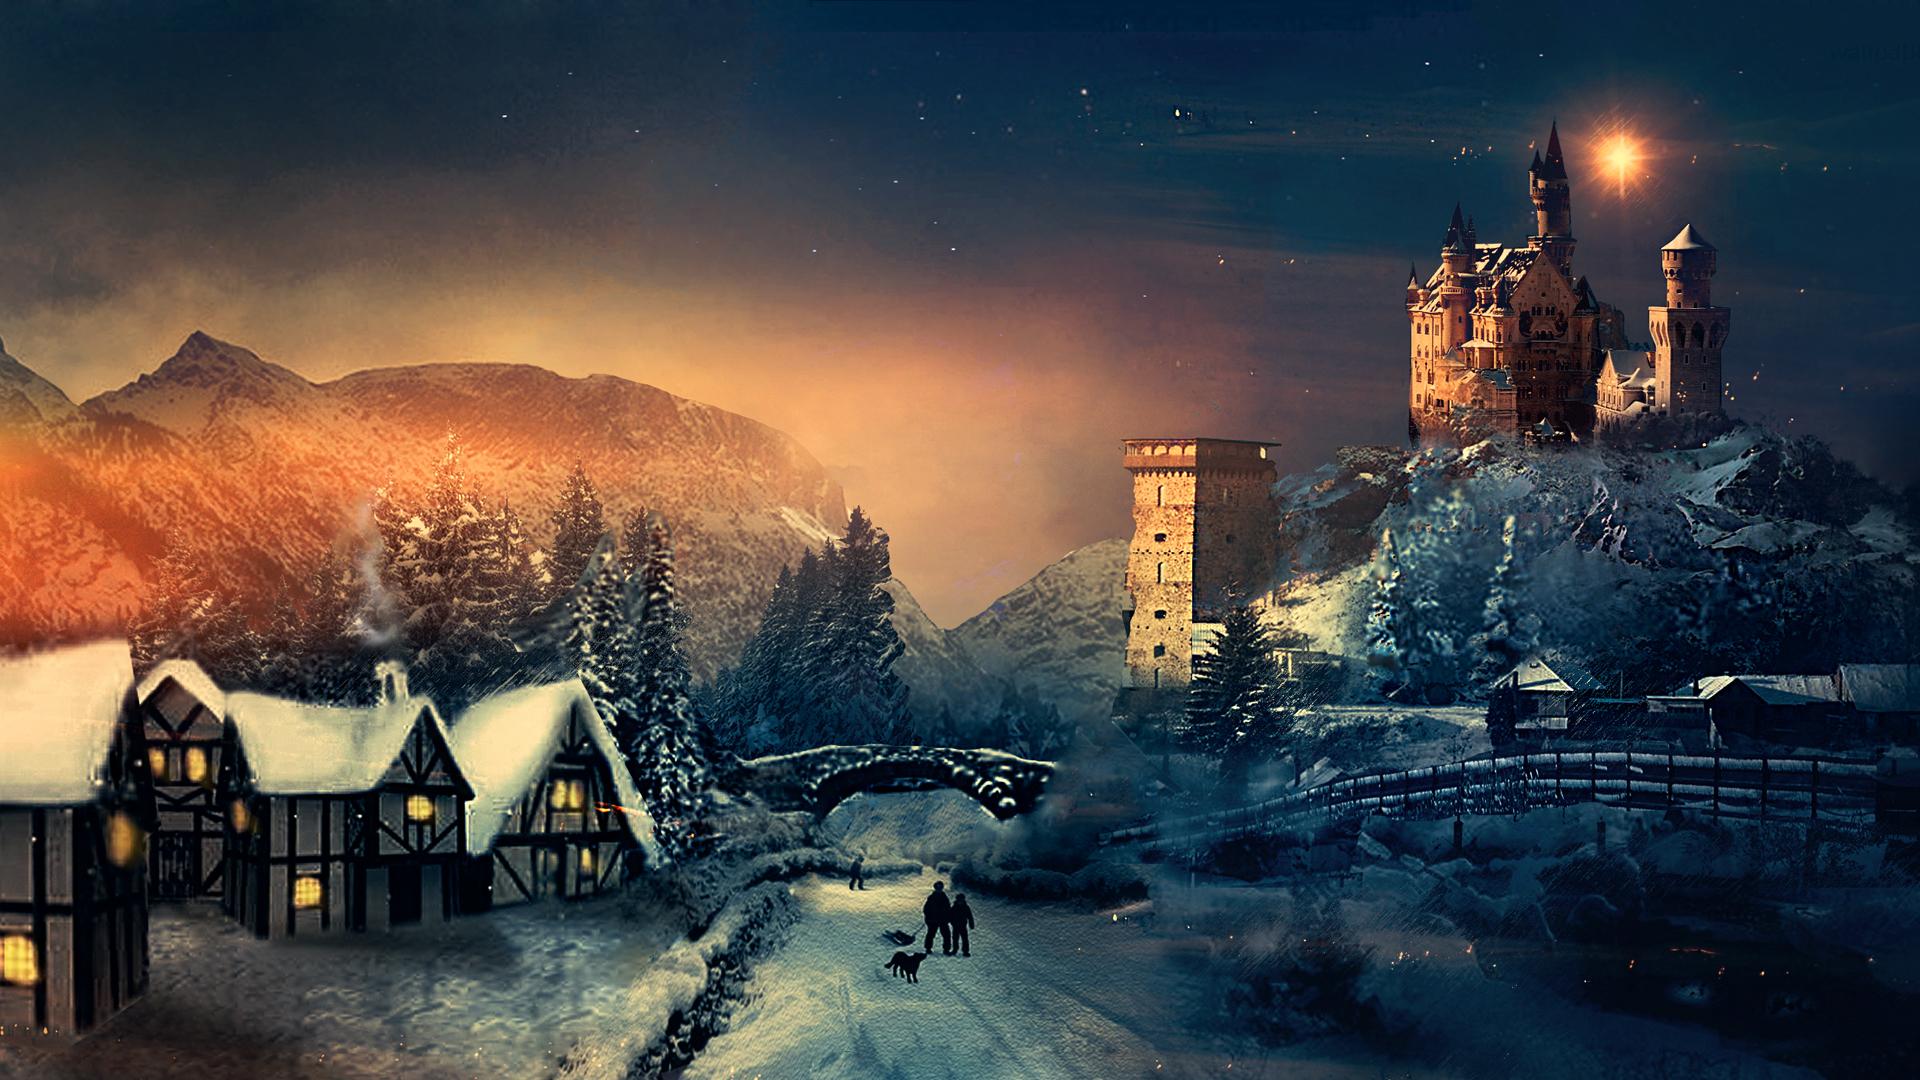 HD Wallpapers Christmas Winter